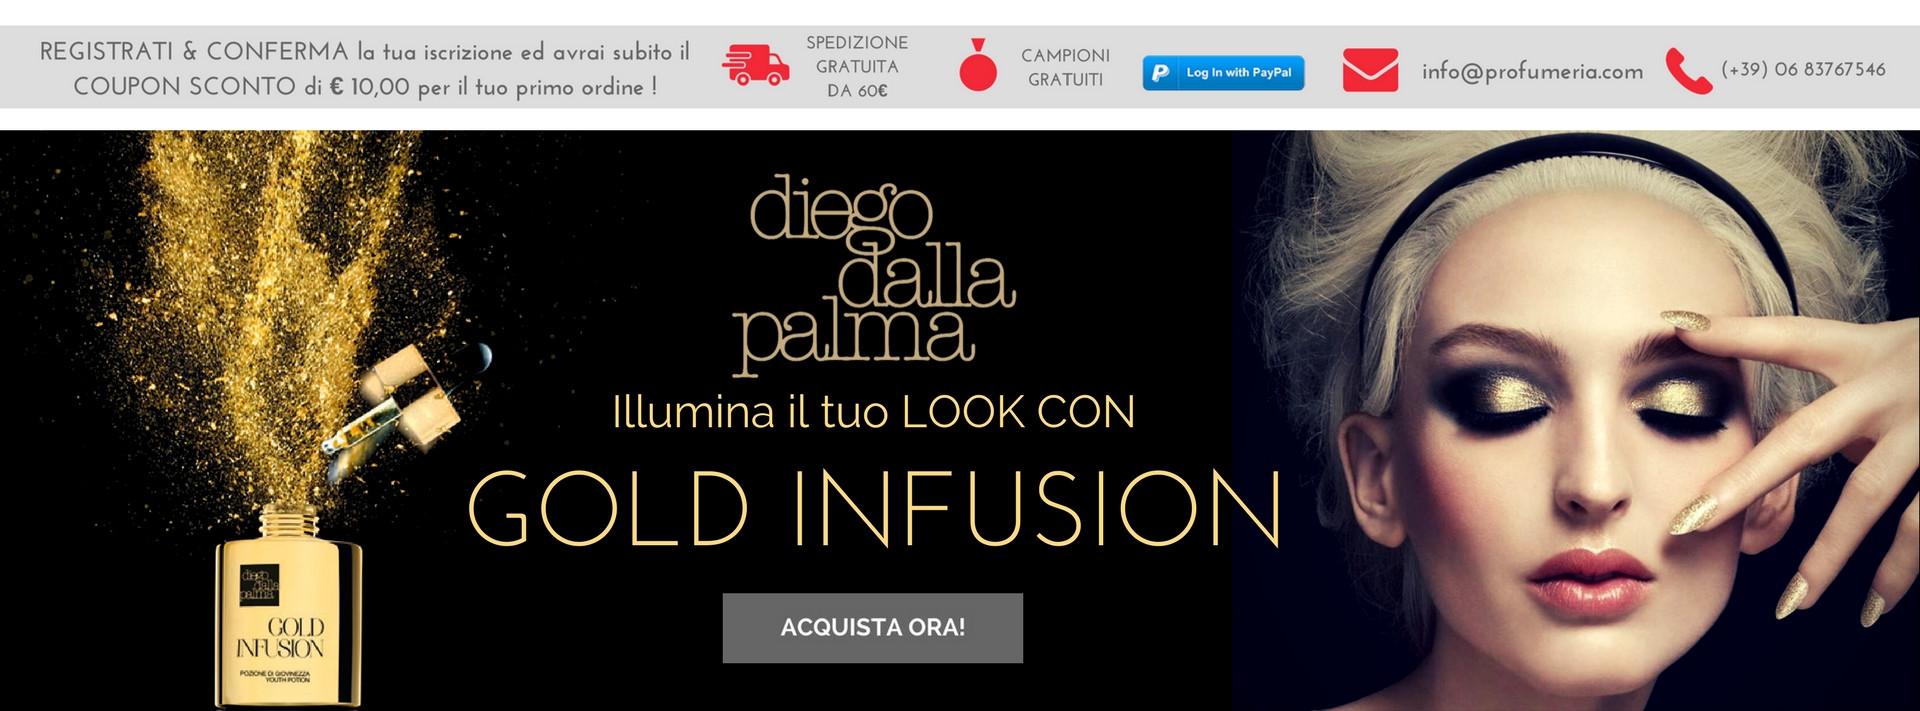 Diego Dalla Palma Gold Infusion !